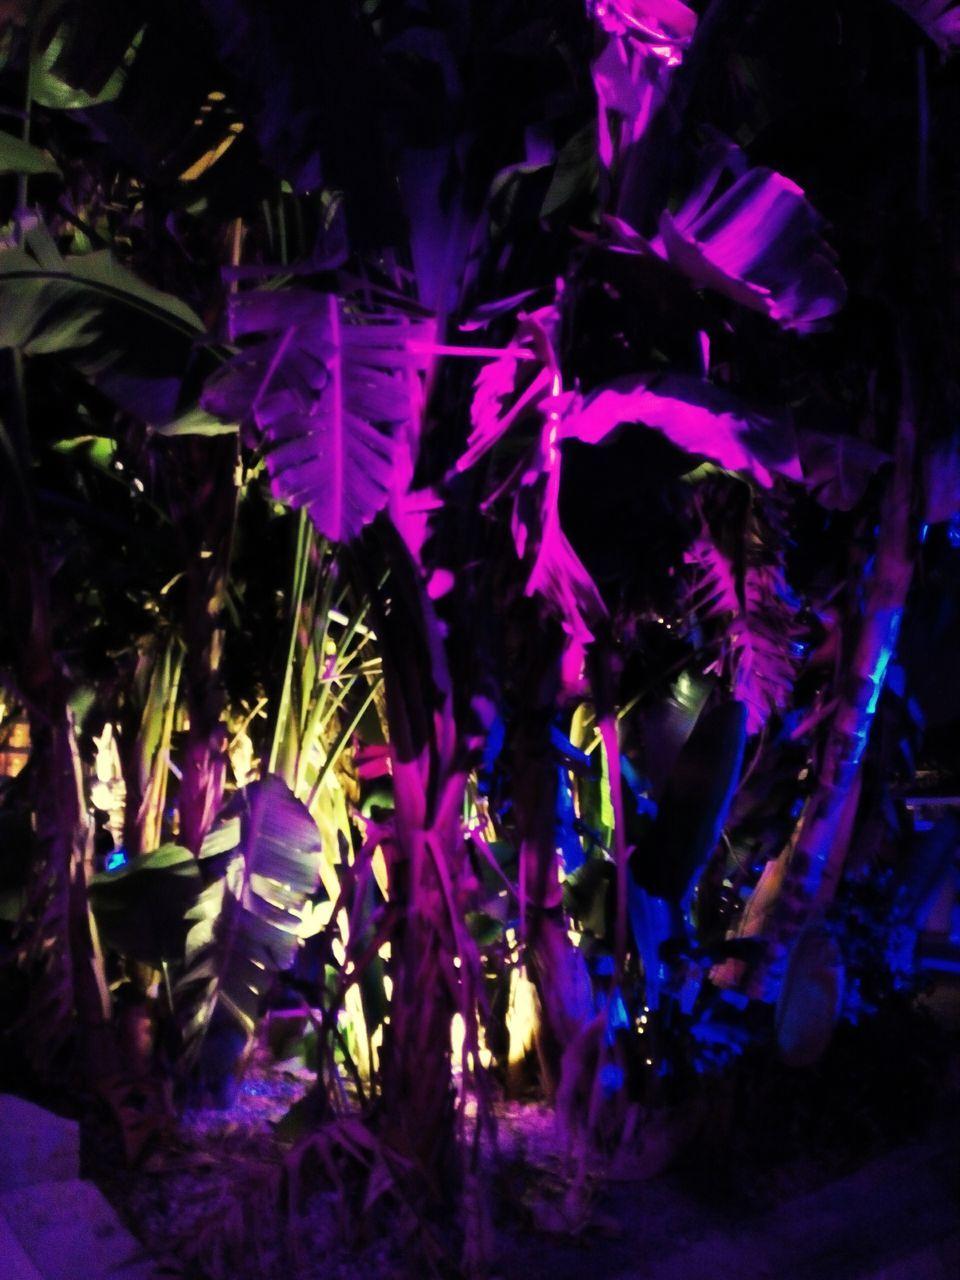 night, purple, no people, illuminated, nature, indoors, close-up, beauty in nature